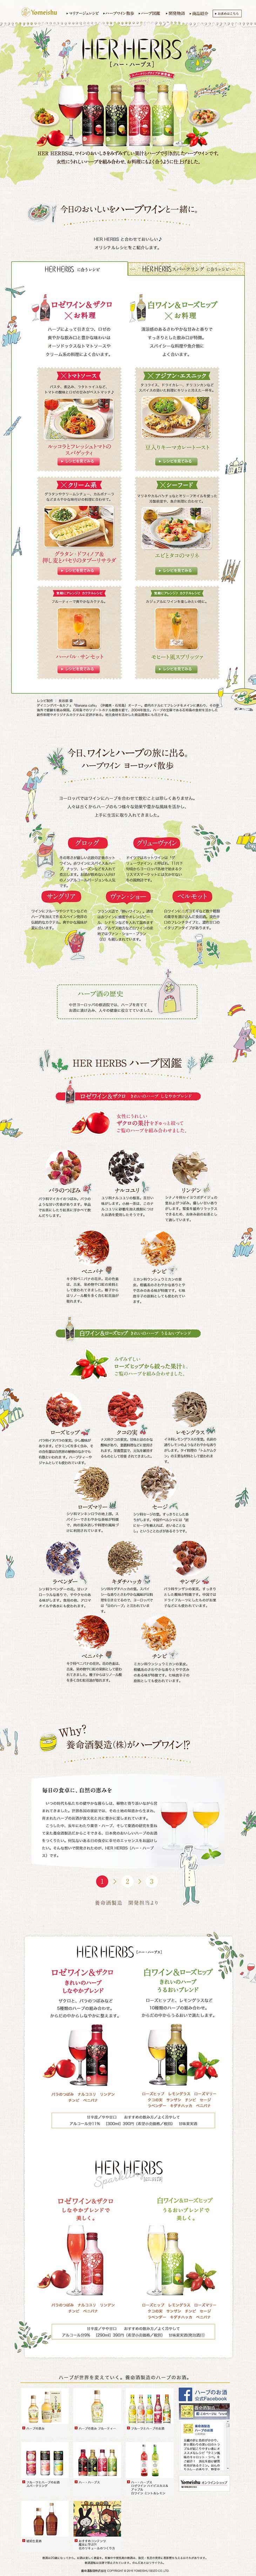 her herbs【飲料・お酒関連】のlpデザイン。webデザイナーさん必見